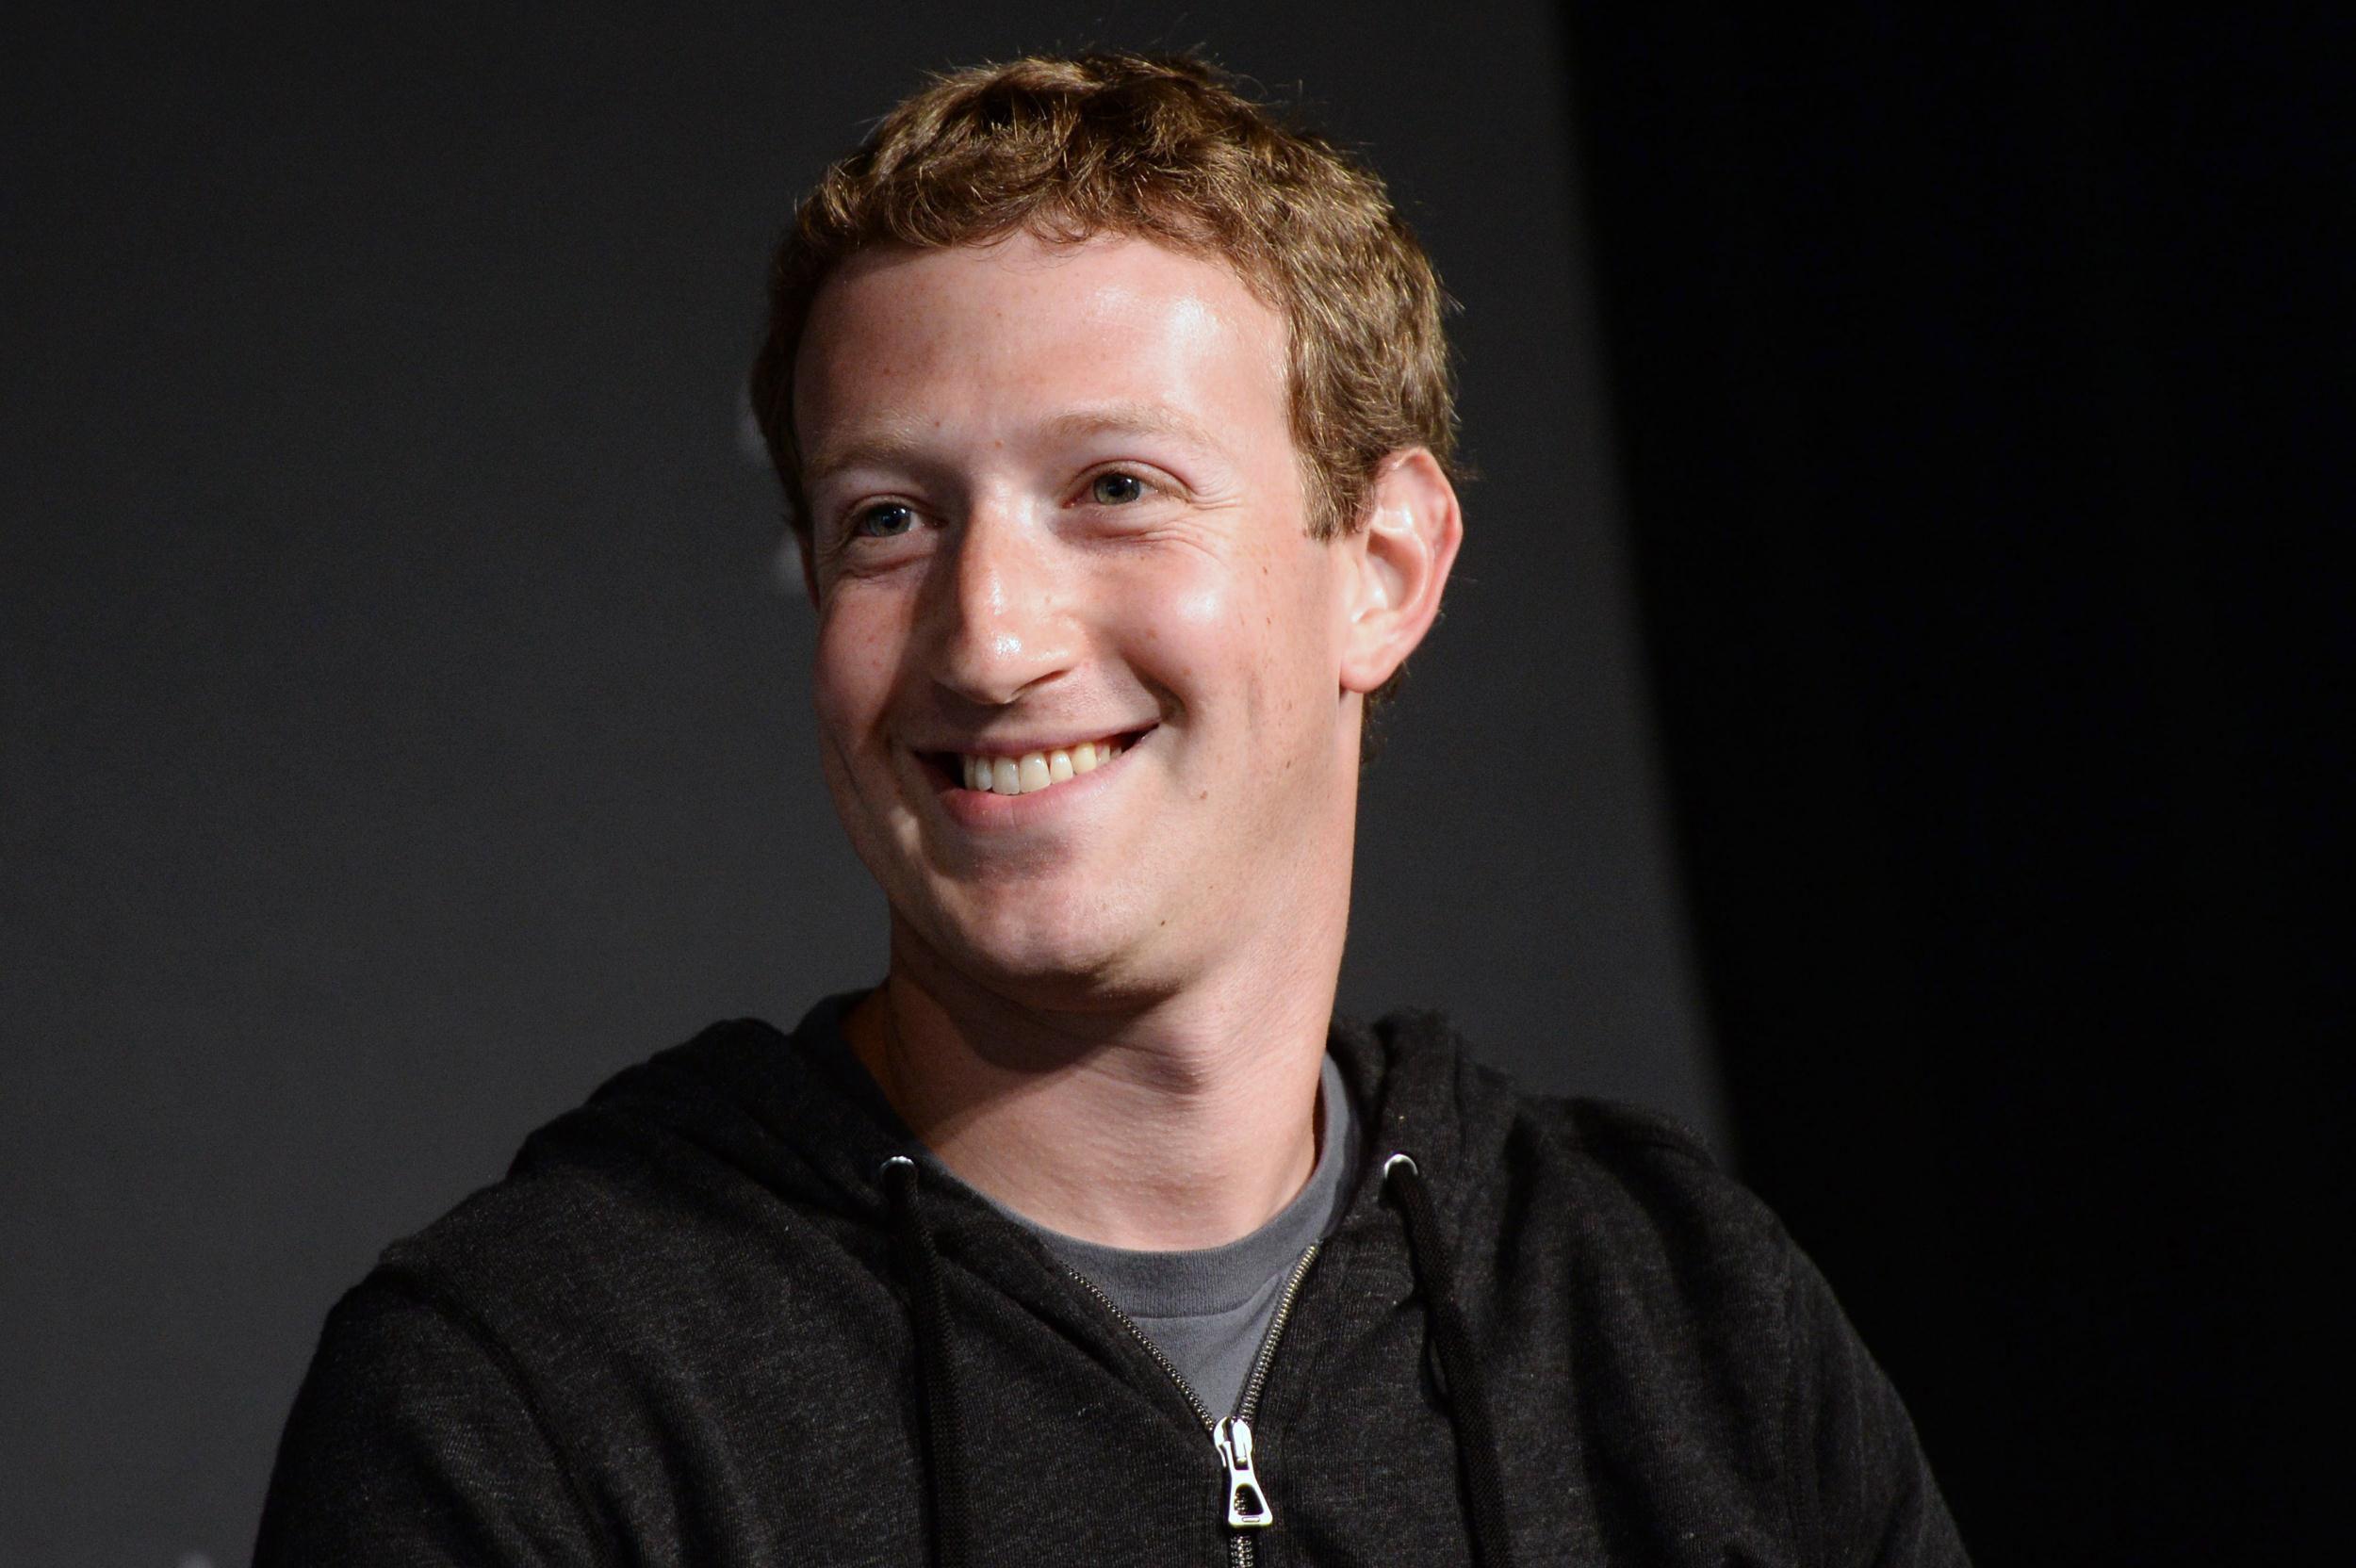 Mark Zuckerberg - Risk taker -